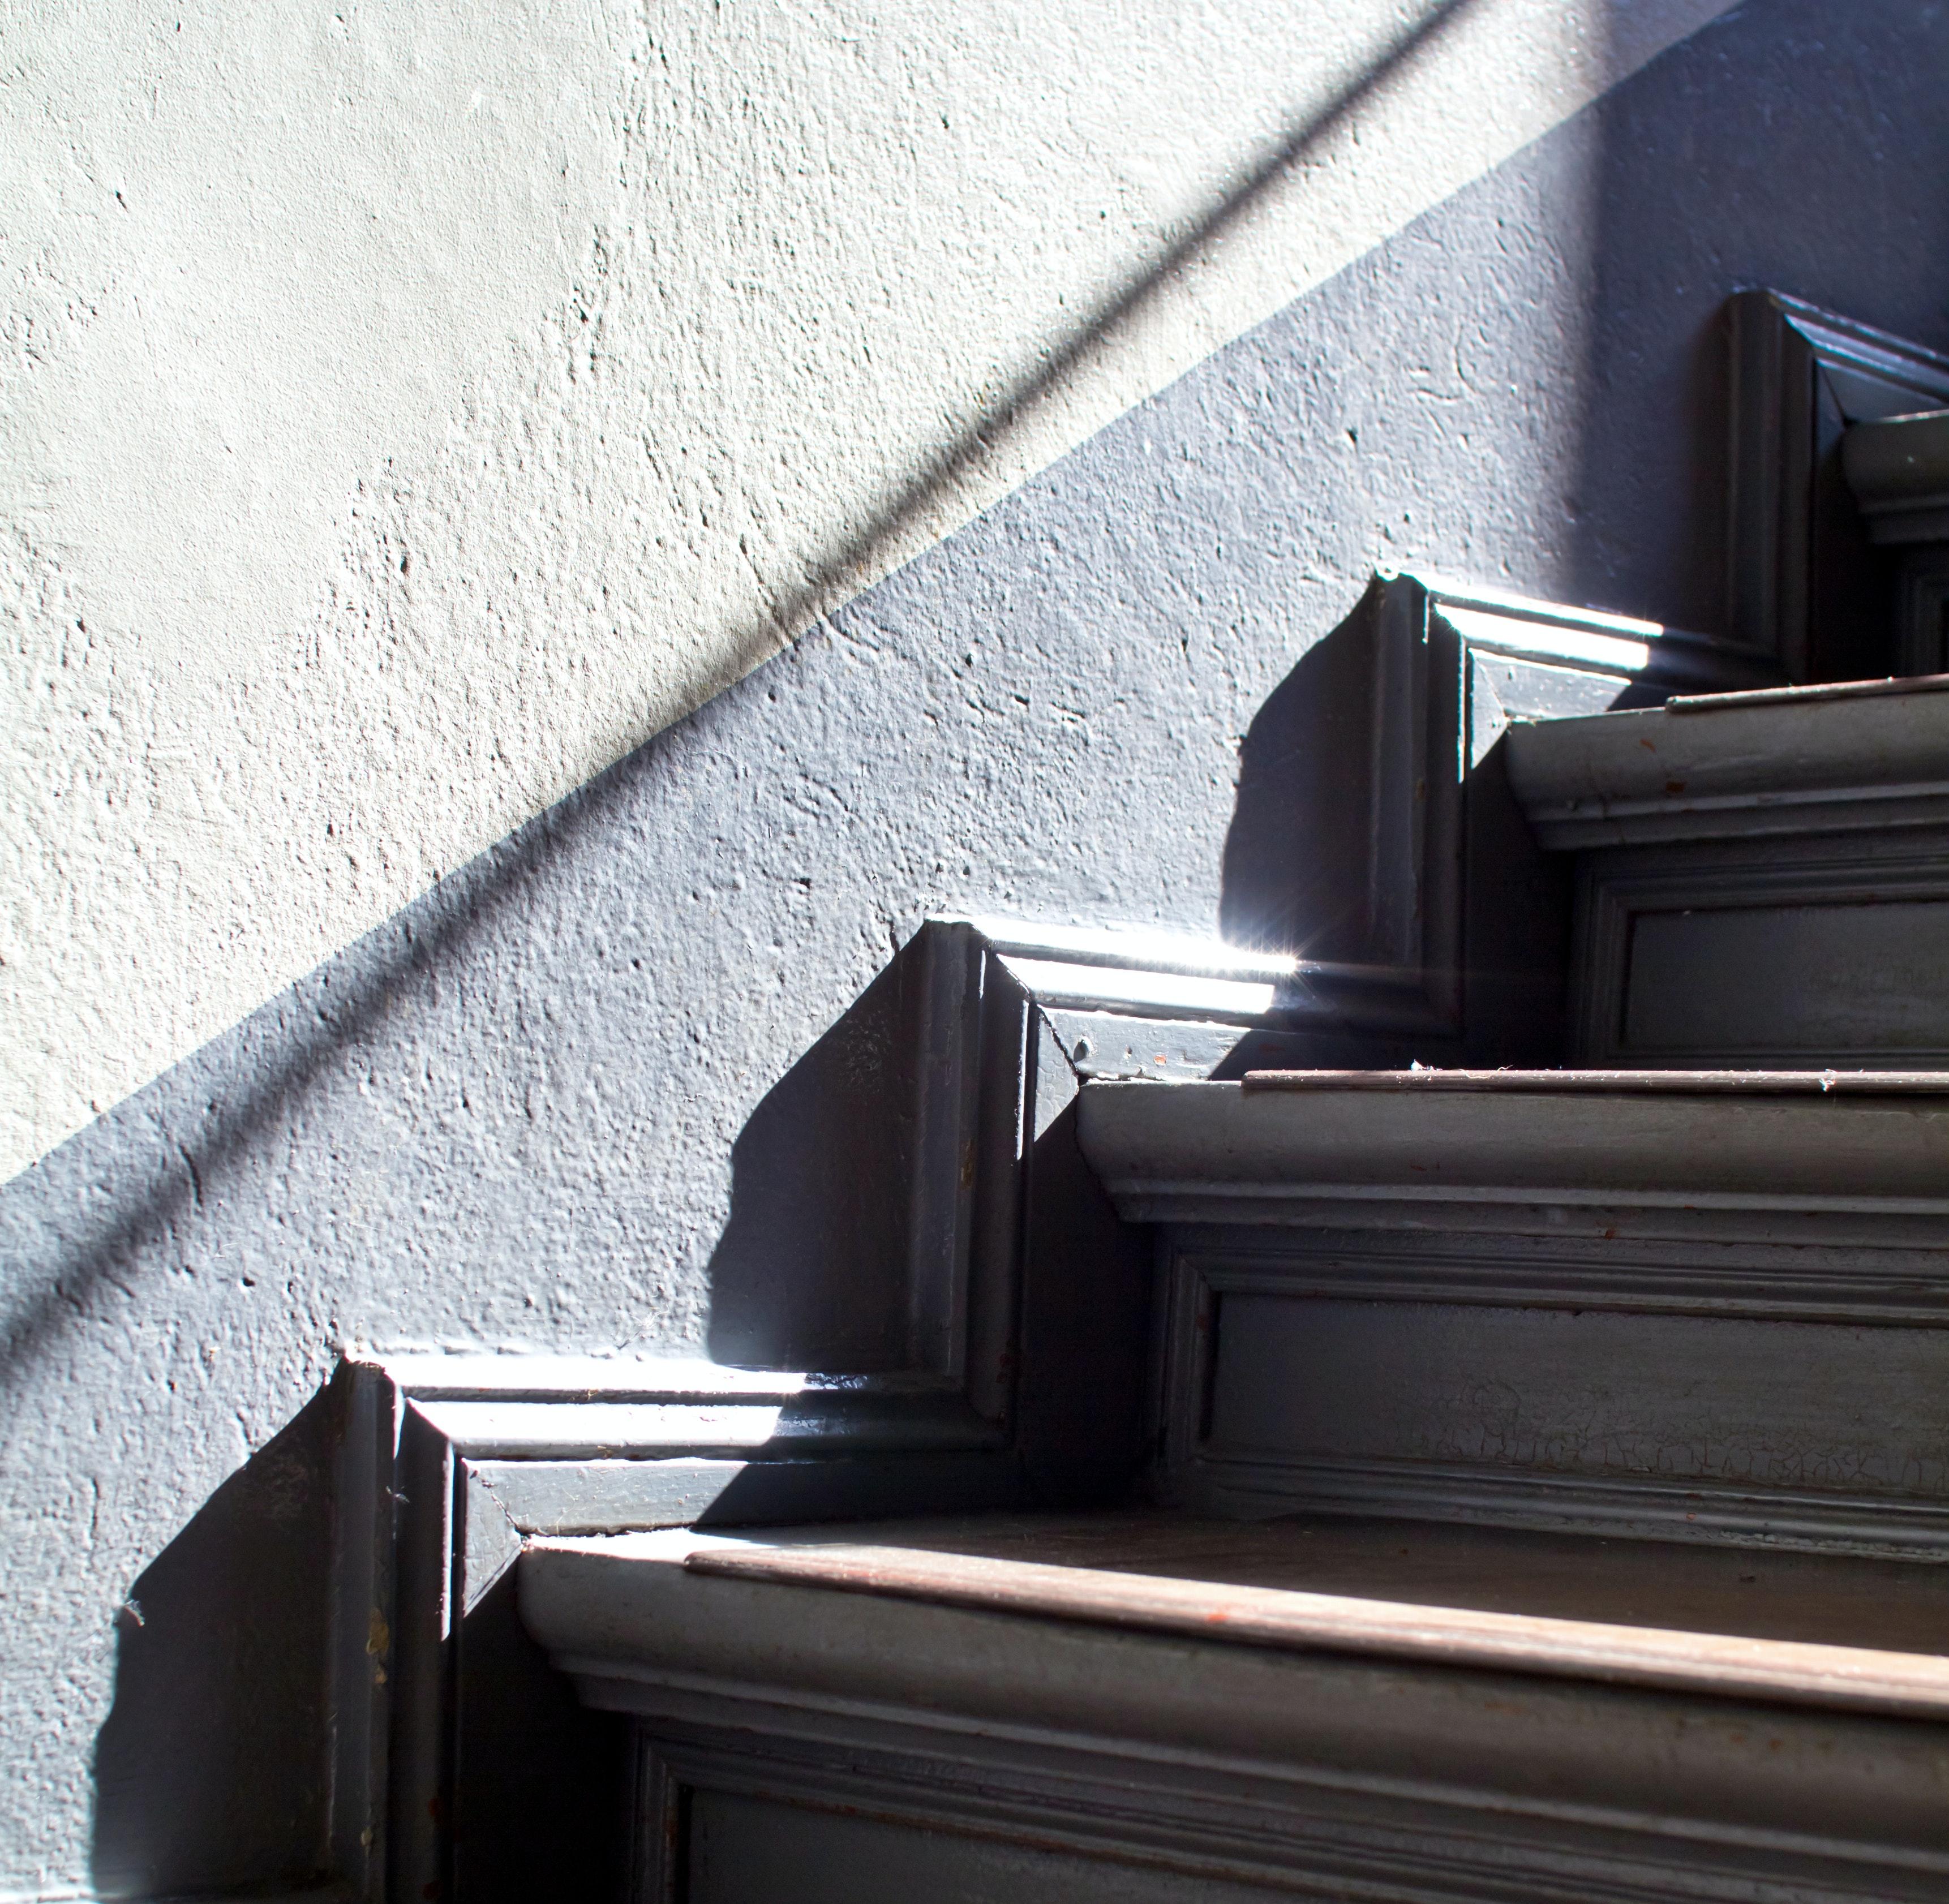 Stairs metaphor postdoc in Austria